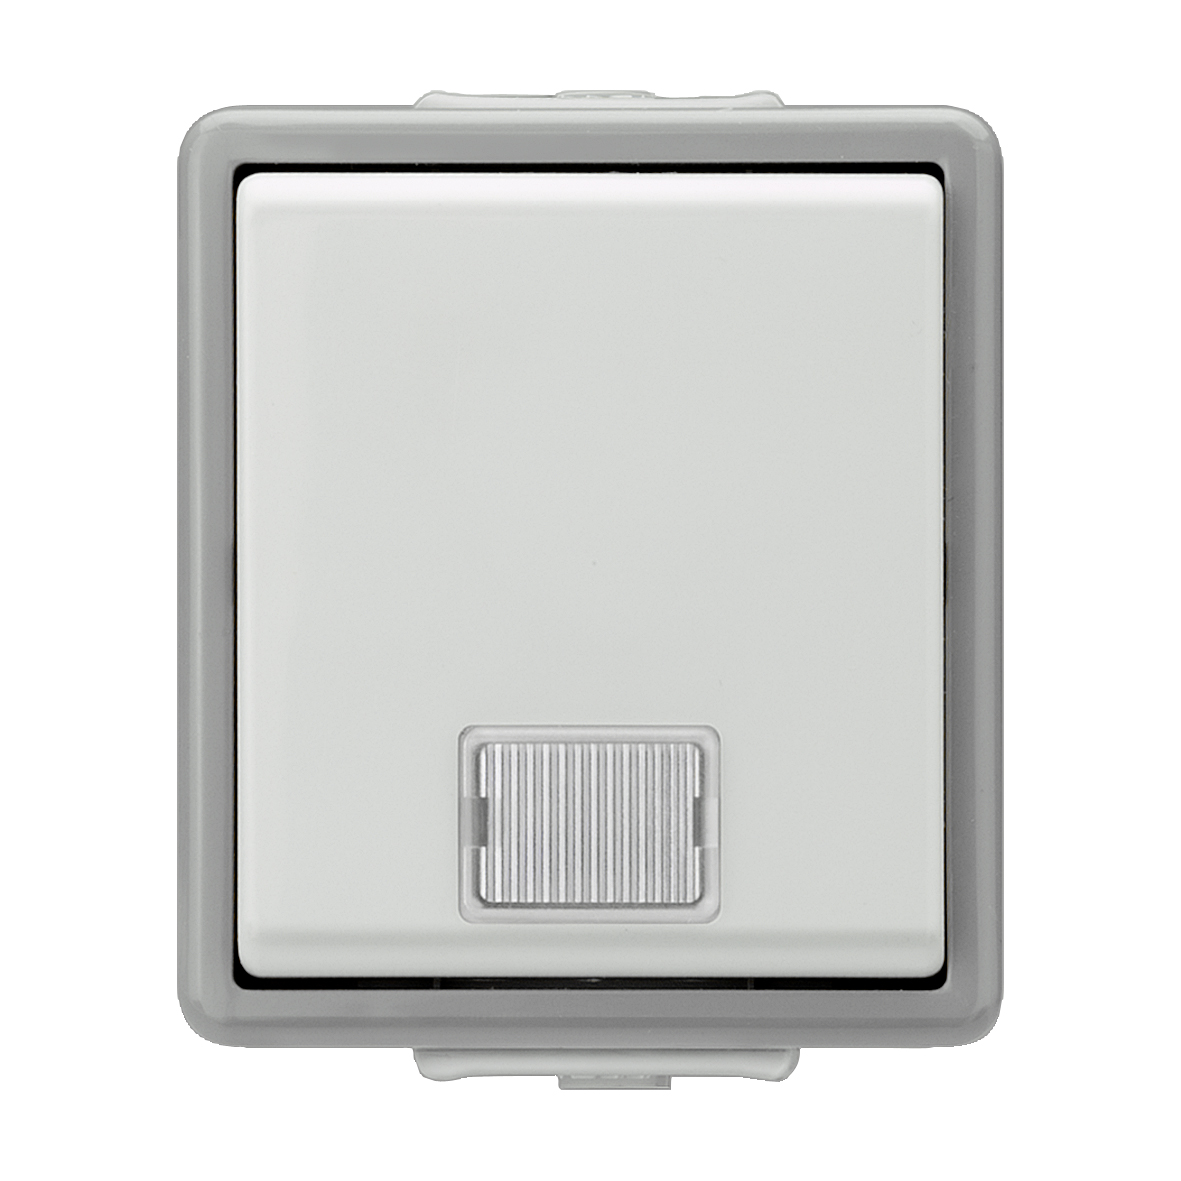 1 Stk Taster 1-fach, Aufputz, Tasterstellung, 1 LED, IP44, grau KX1153AB21